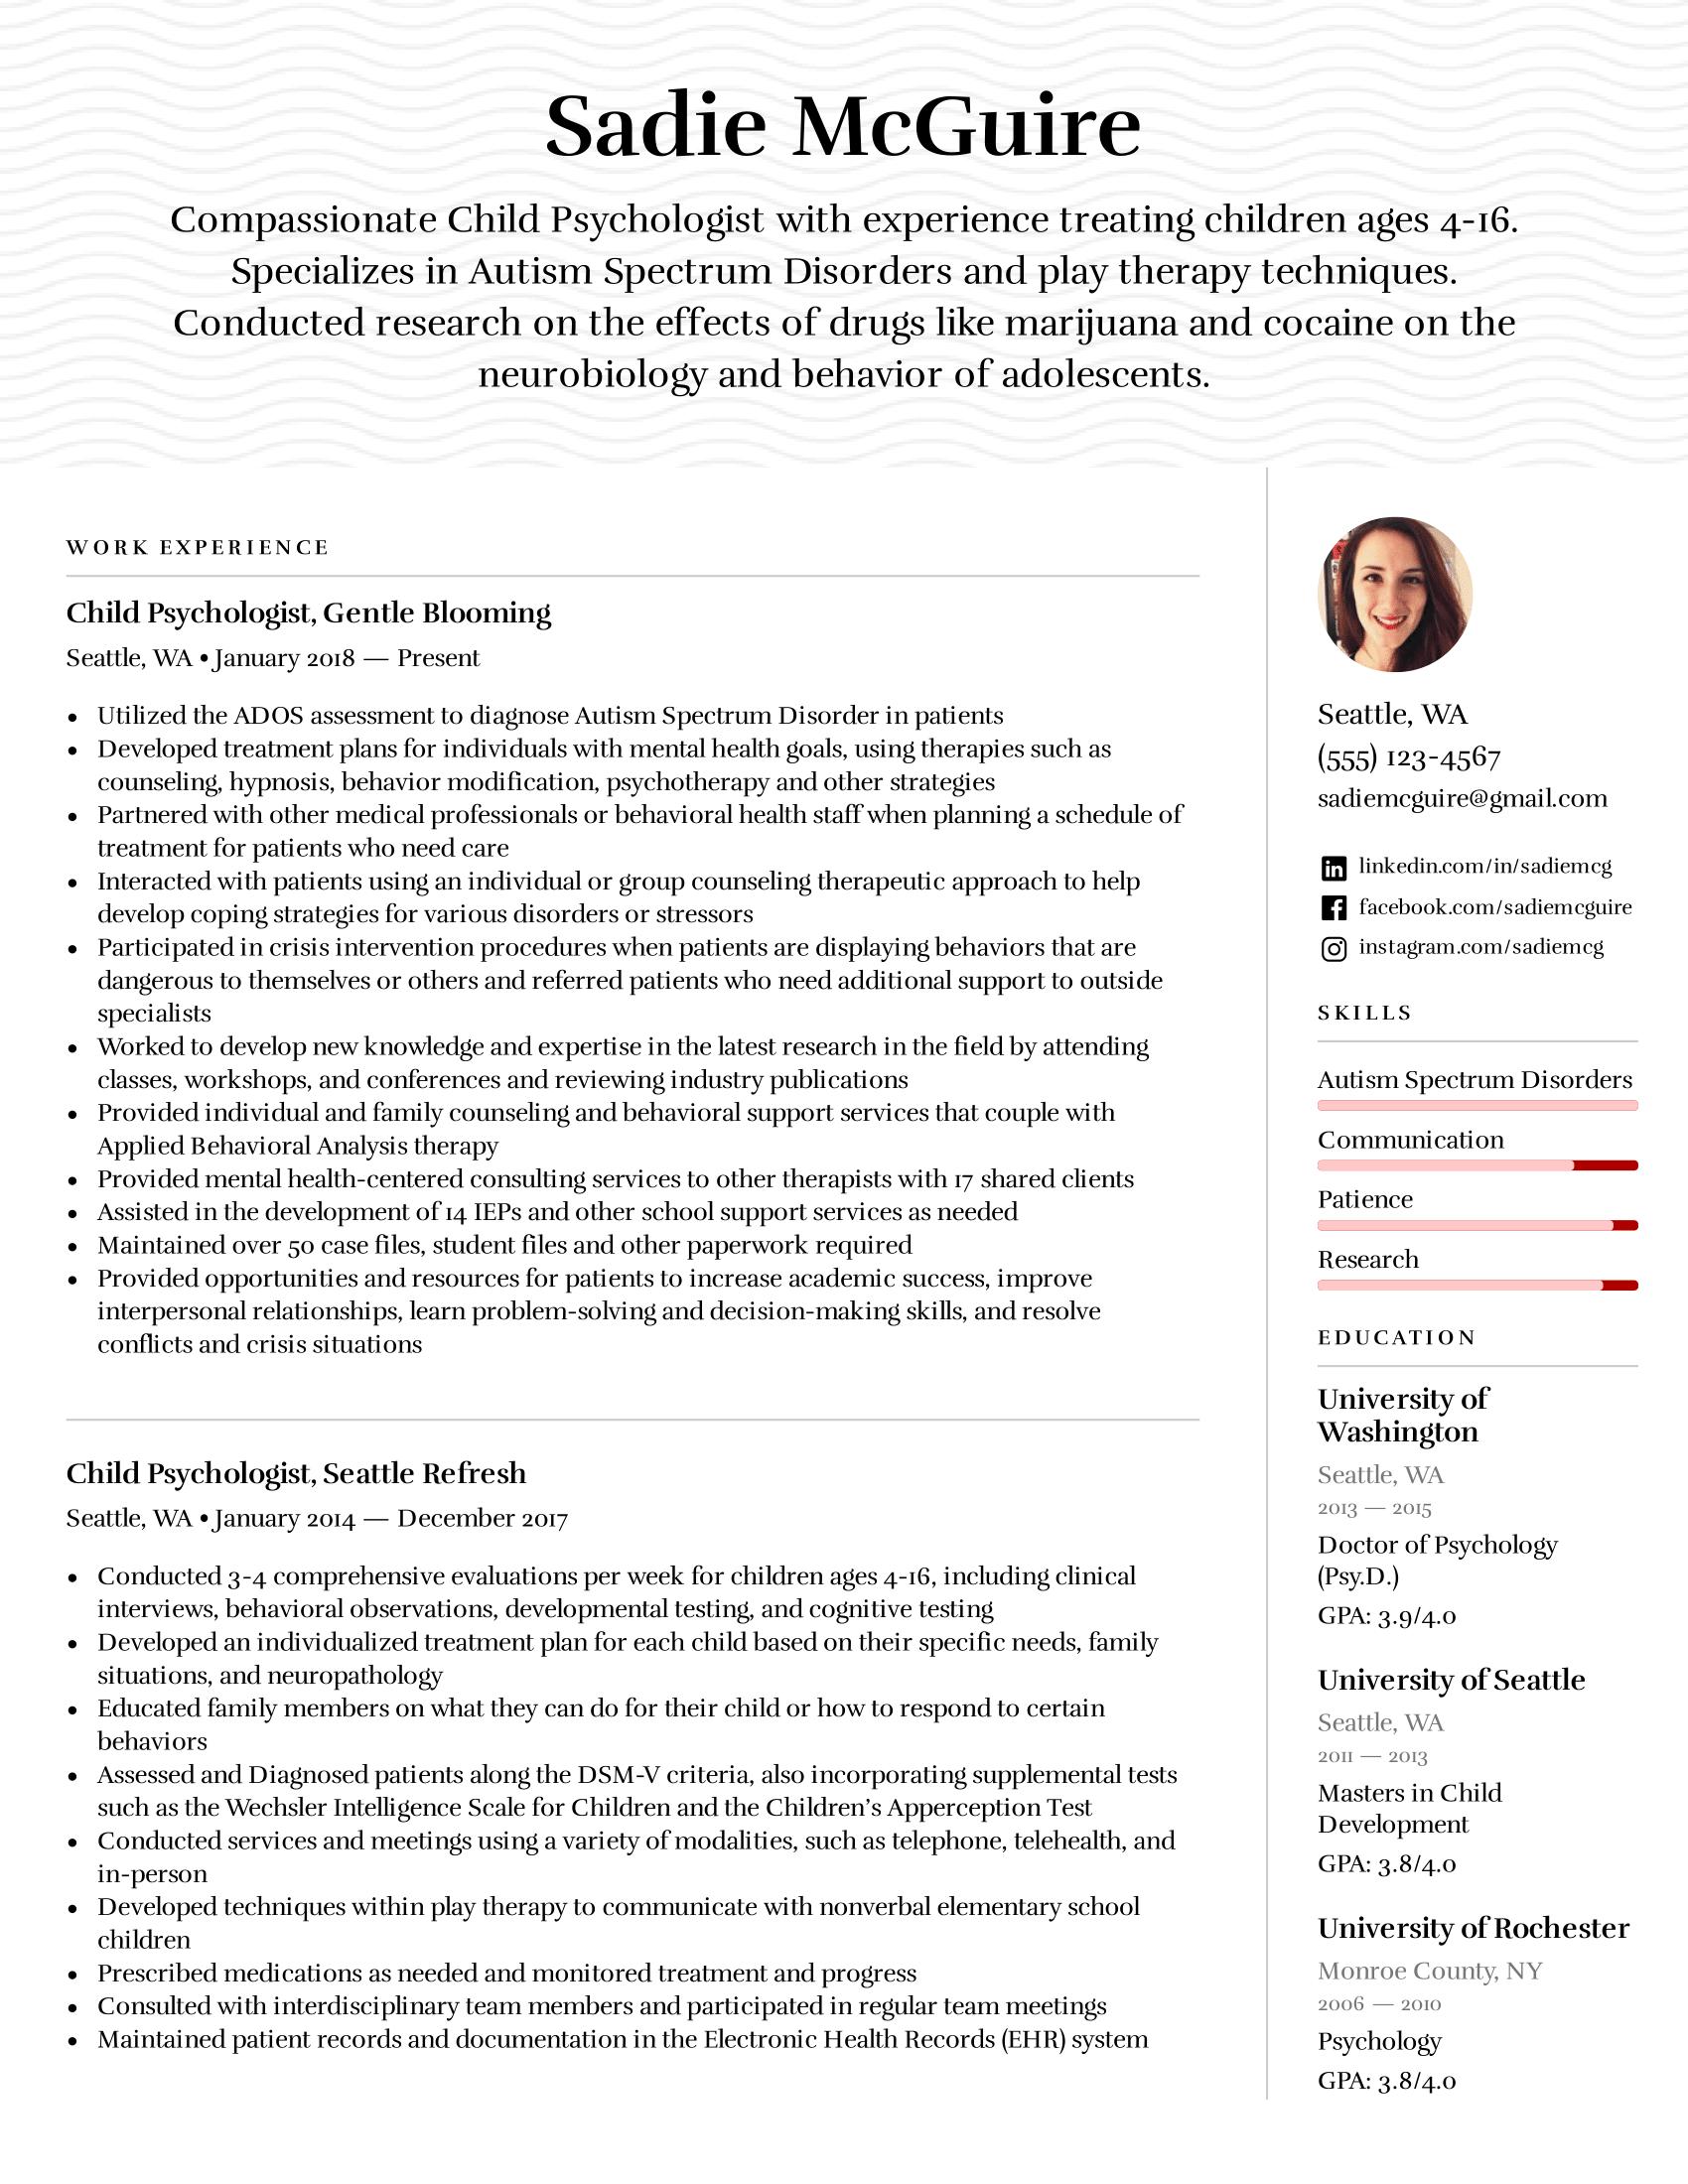 Child Psychologist Resume Example